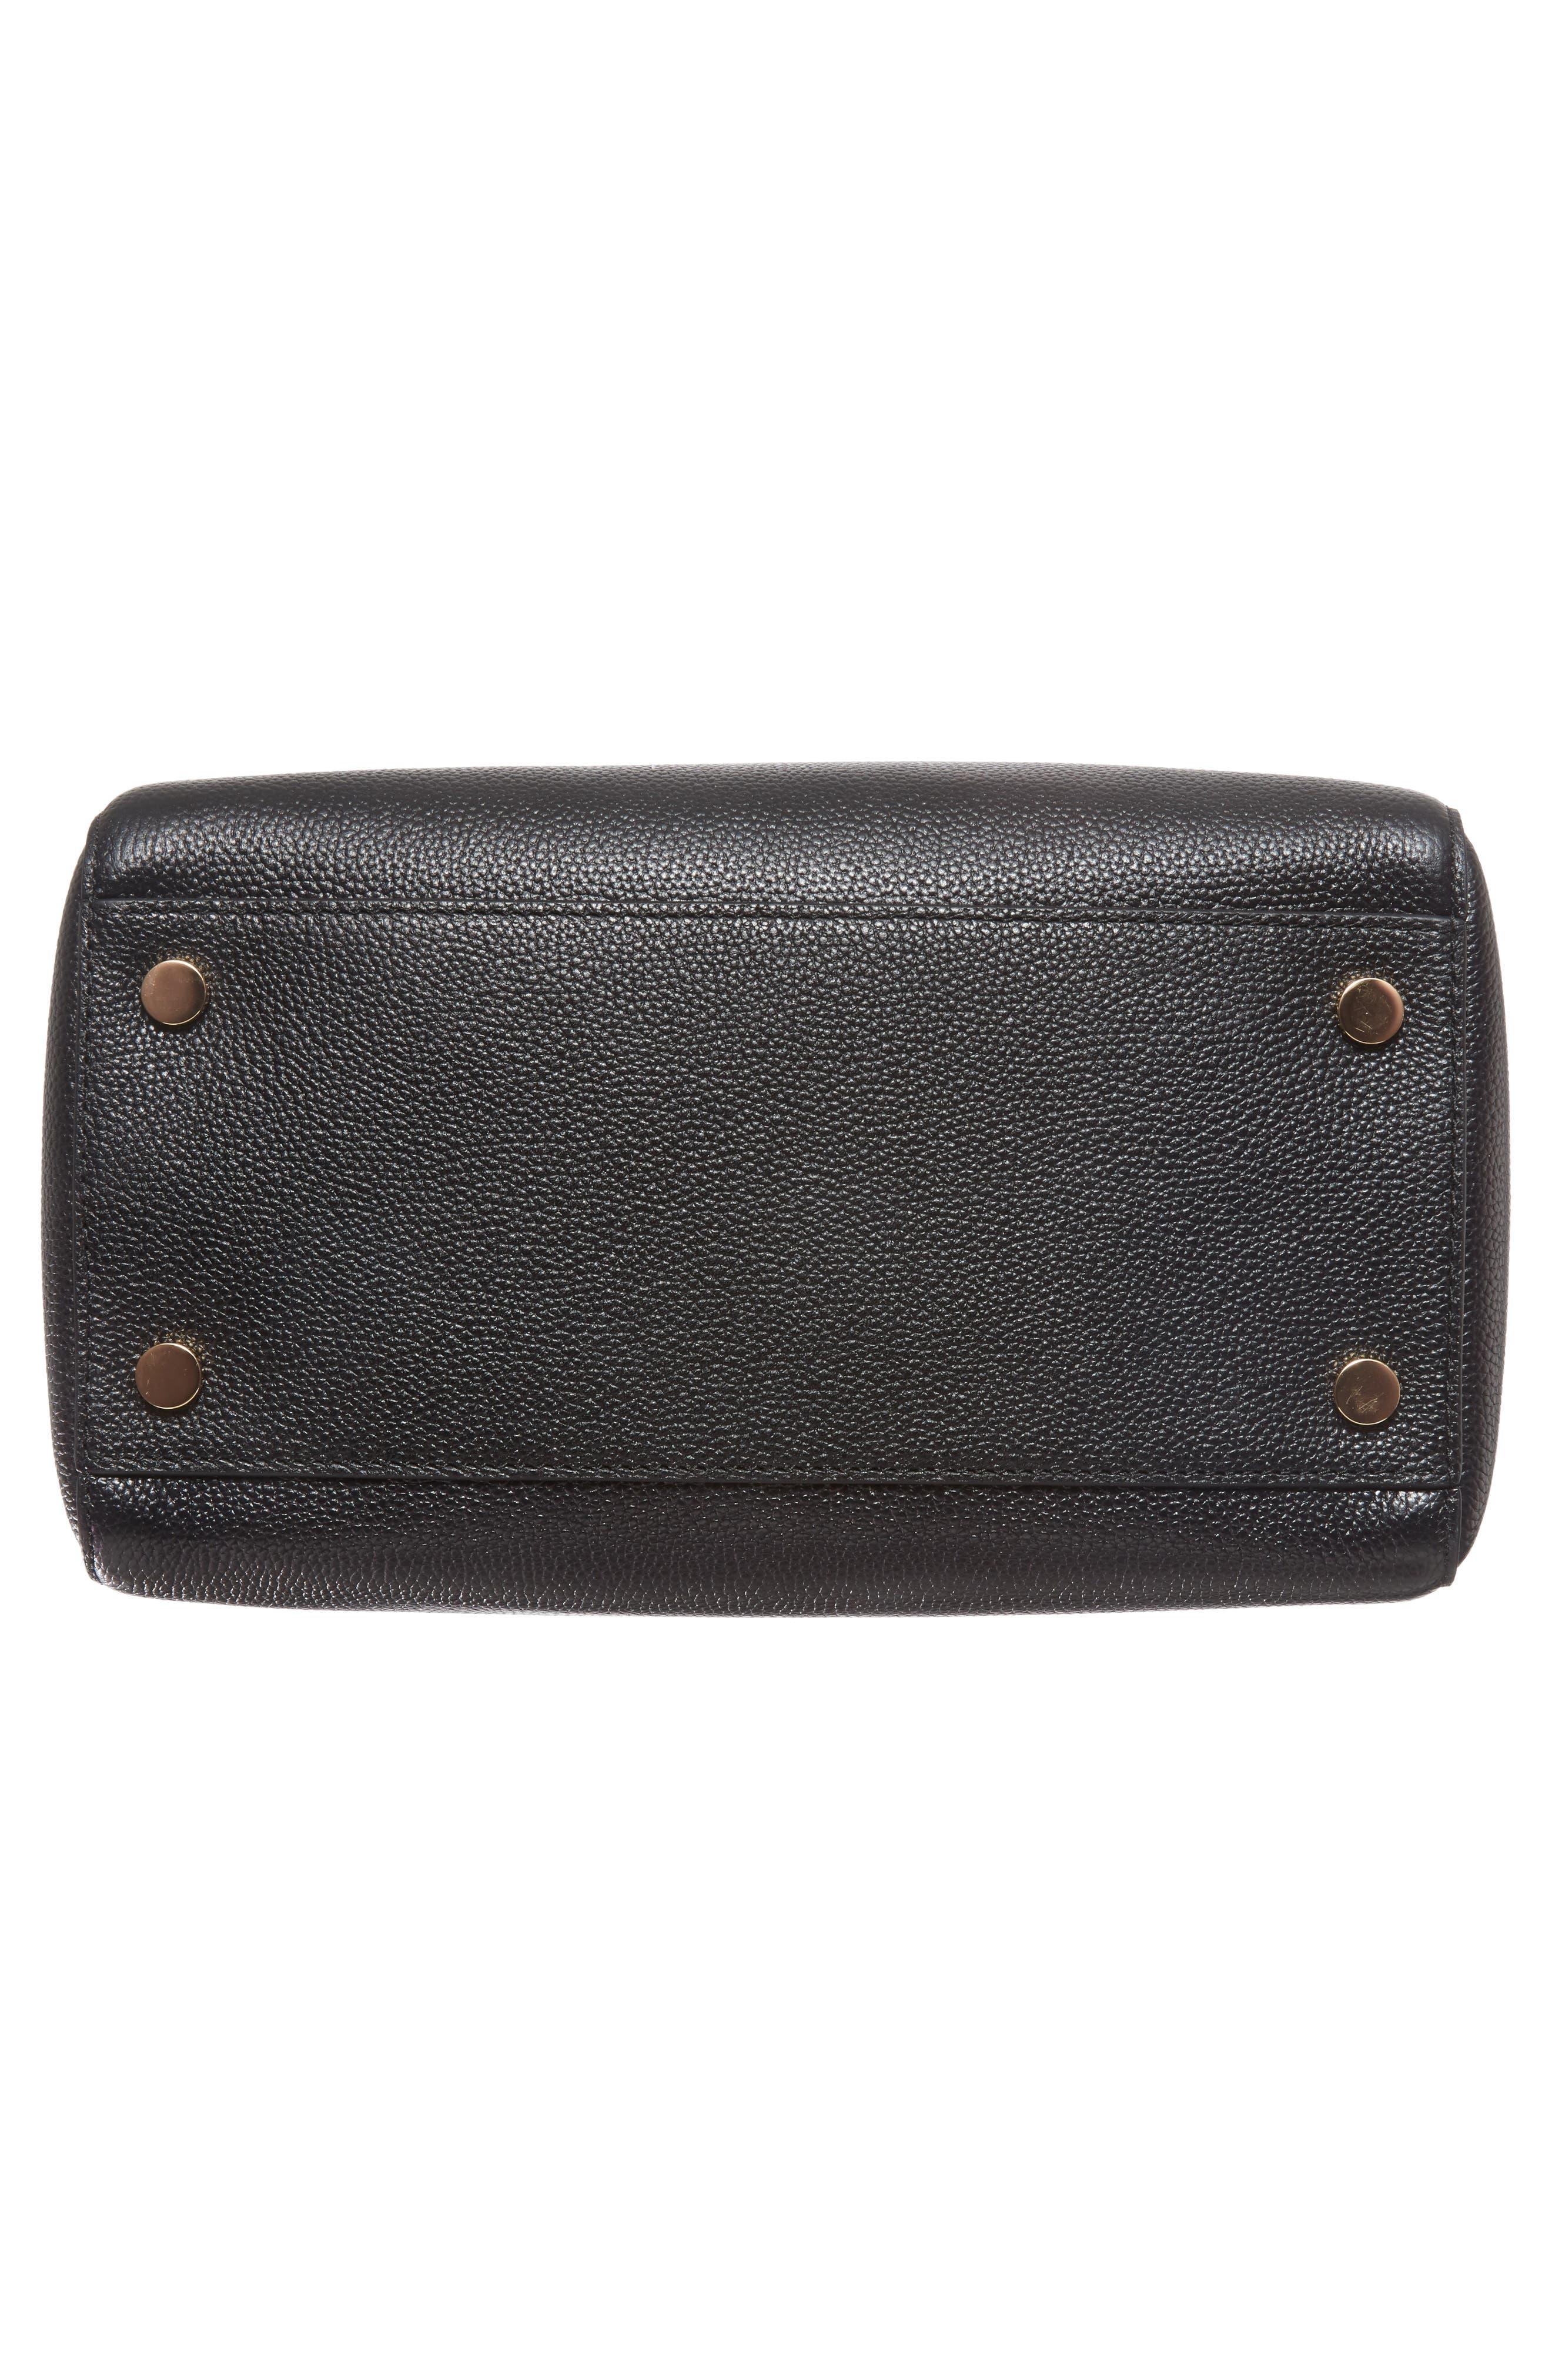 Medium Mercer Duffel Bag,                             Alternate thumbnail 4, color,                             001